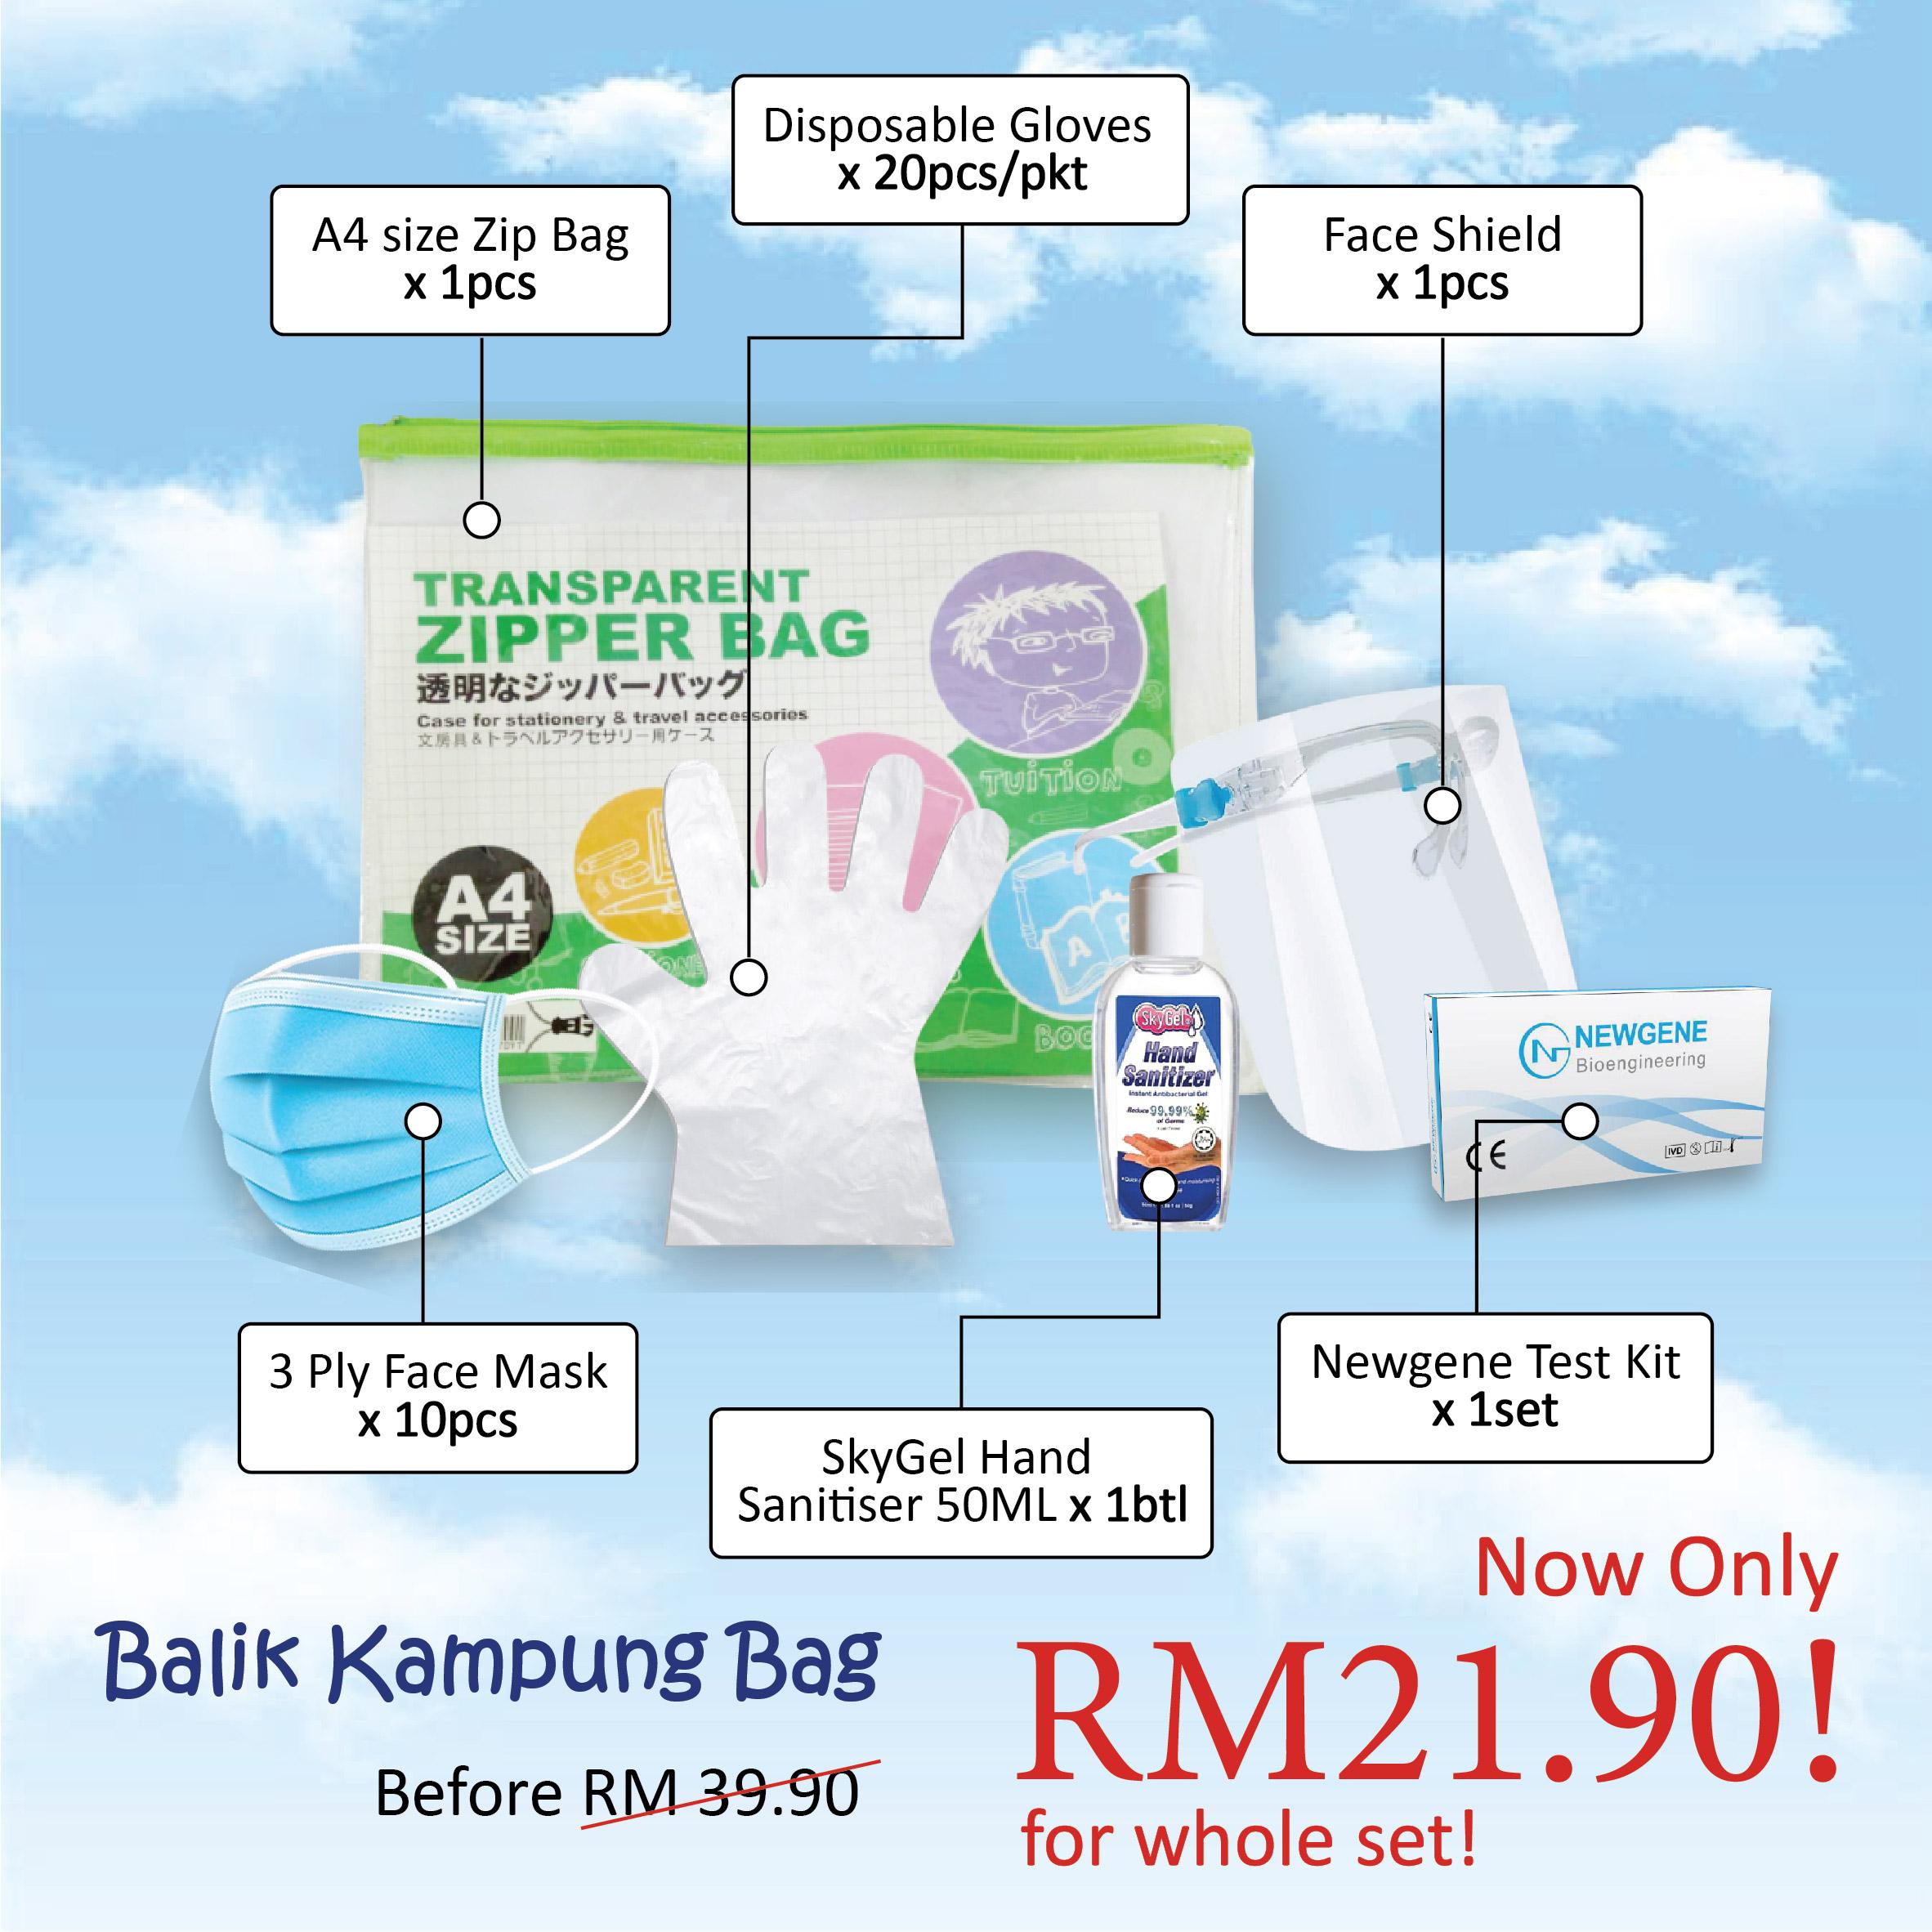 Balik Kampung Bag (Only RM21.90 for Whole Set !)